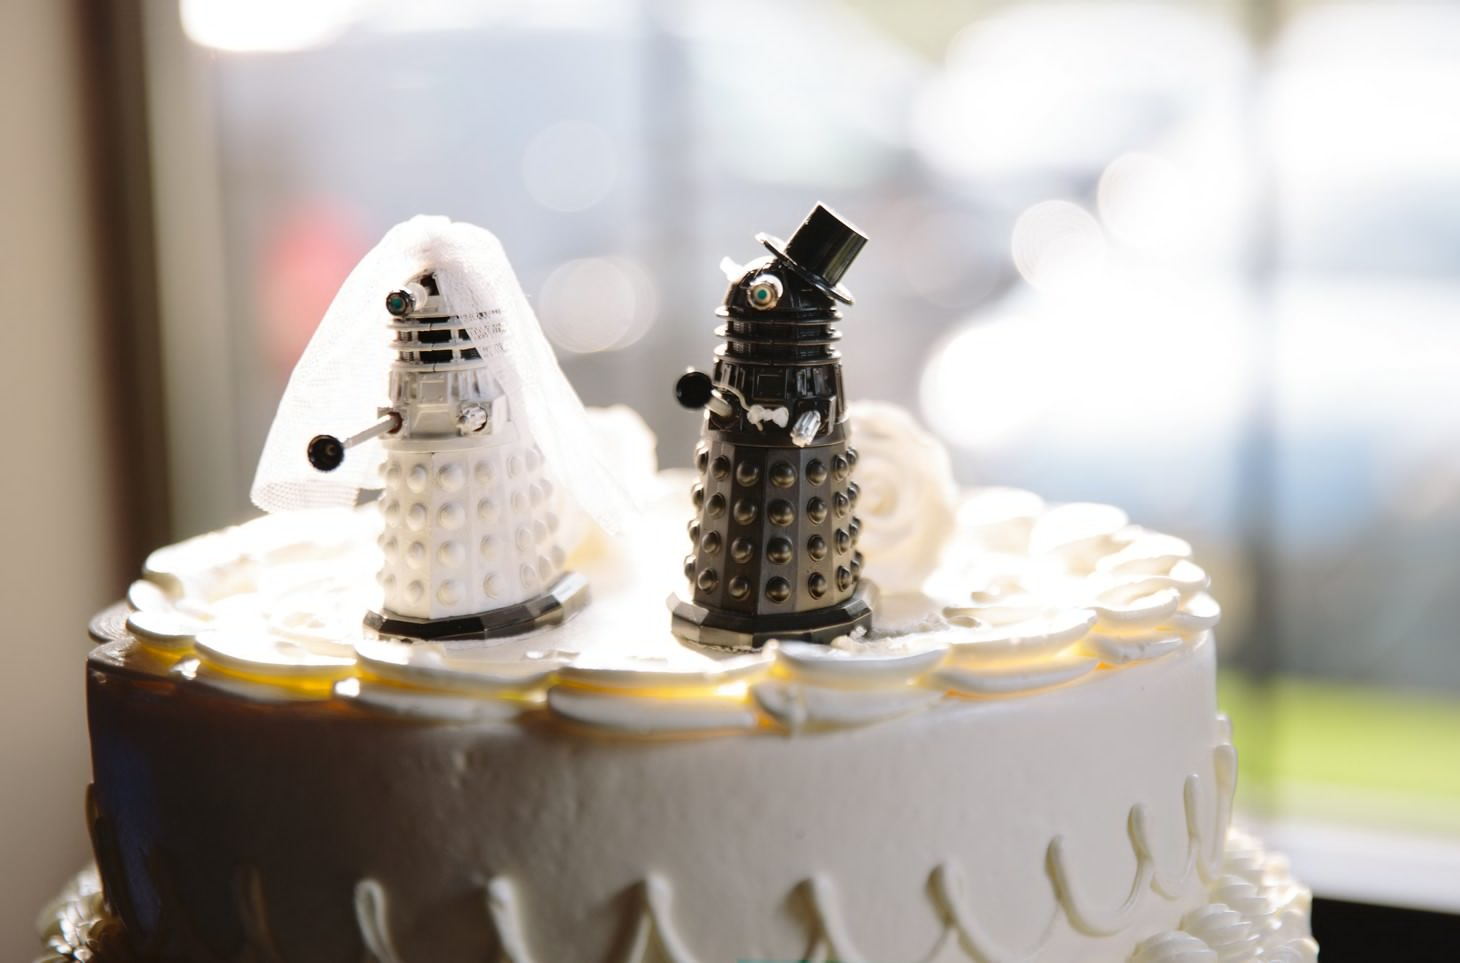 046-nyc-wedding-photographer-nj-nerdy-dr-who-firehouse-wedding-smitten-chickens.jpg